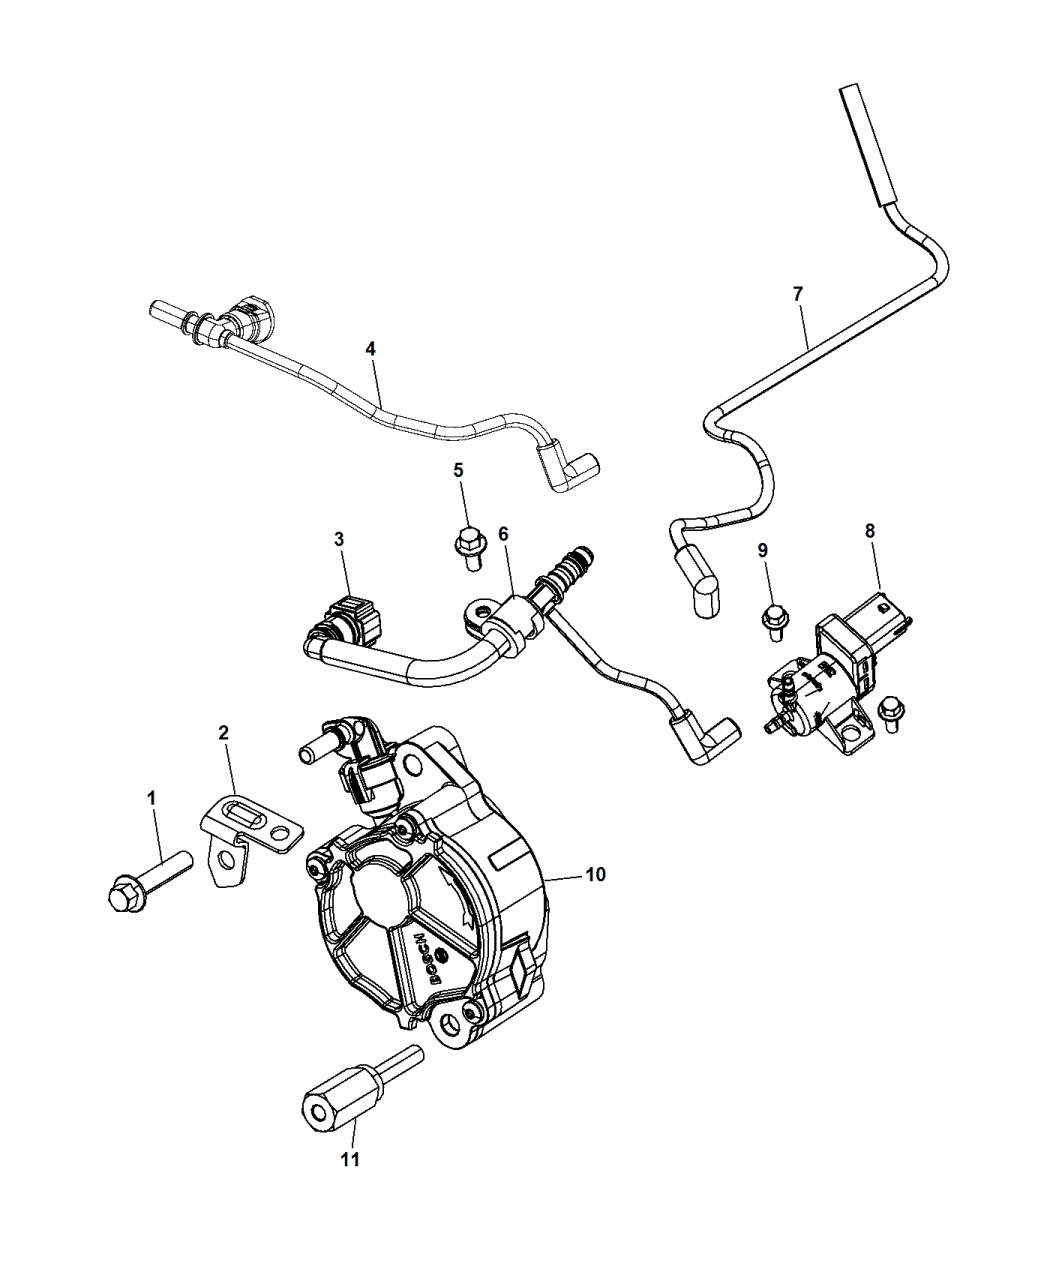 [OY_5651] Jeep Cherokee Evap Diagram Free Diagram